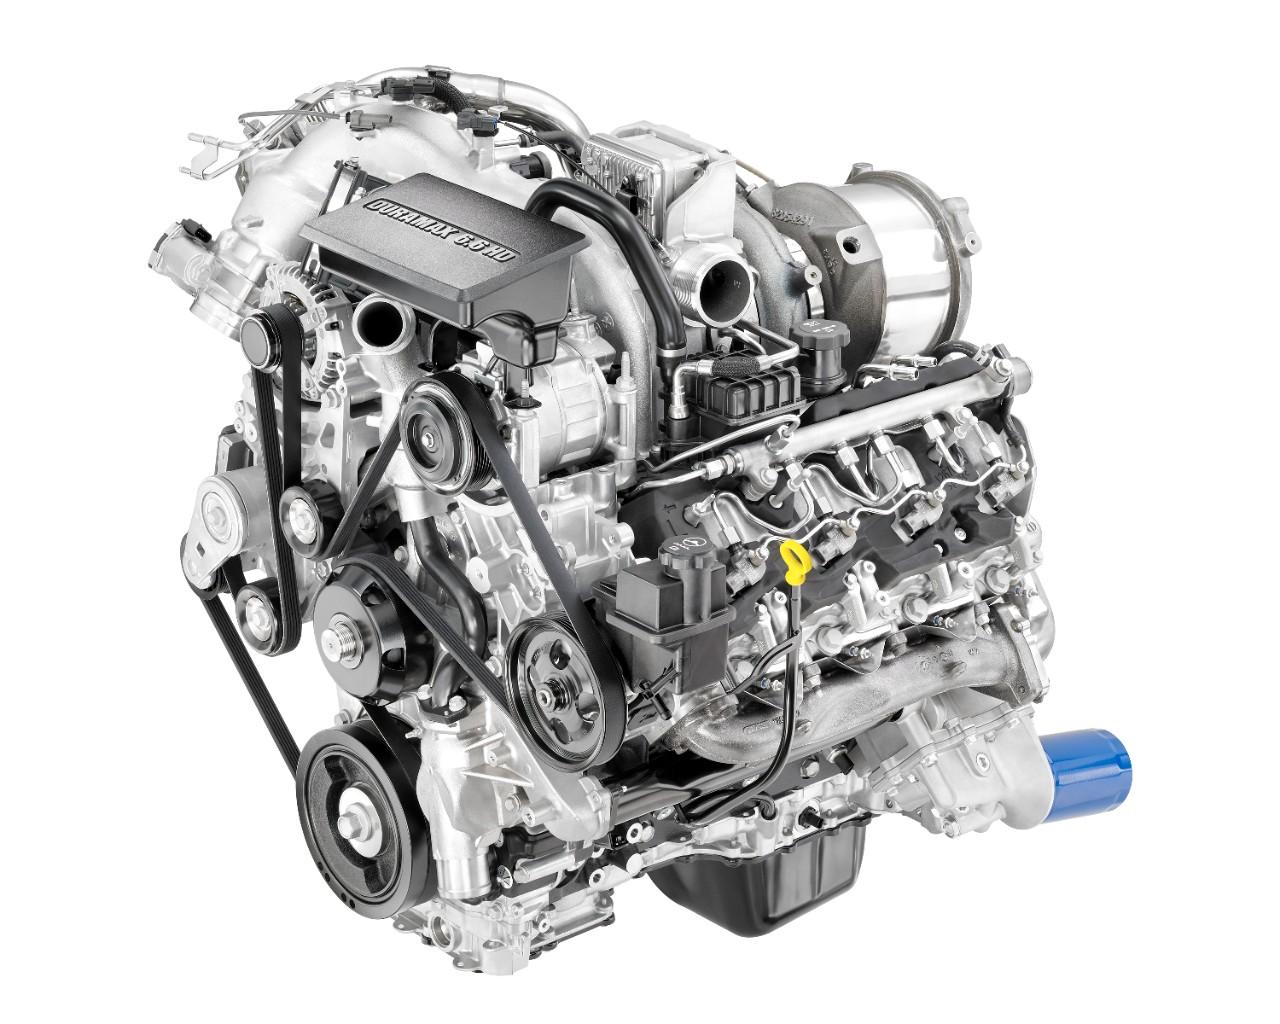 Duramax Liter V Turbo Diesel L P Engine